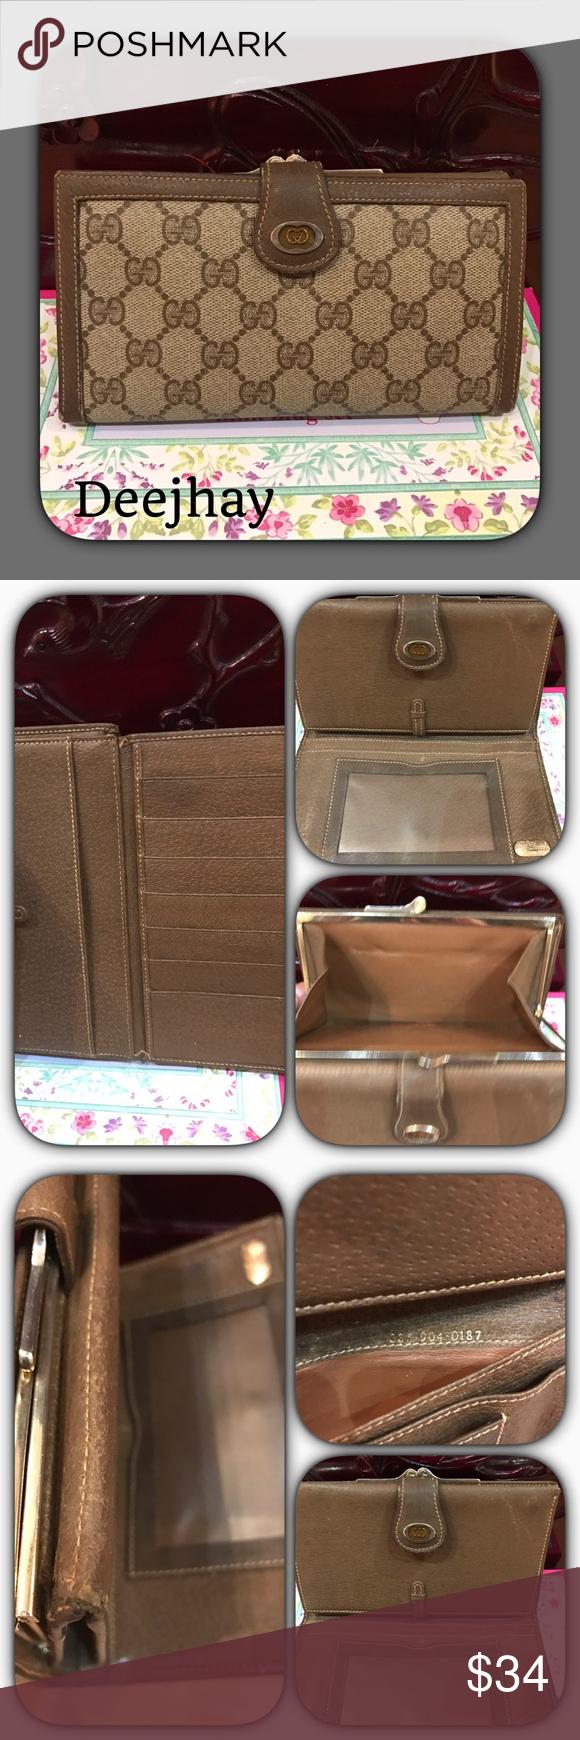 e8e77f8c6b0 Vintage Gucci wallet Authentic vintage Gucci wallet. Outside condition-  Scratches